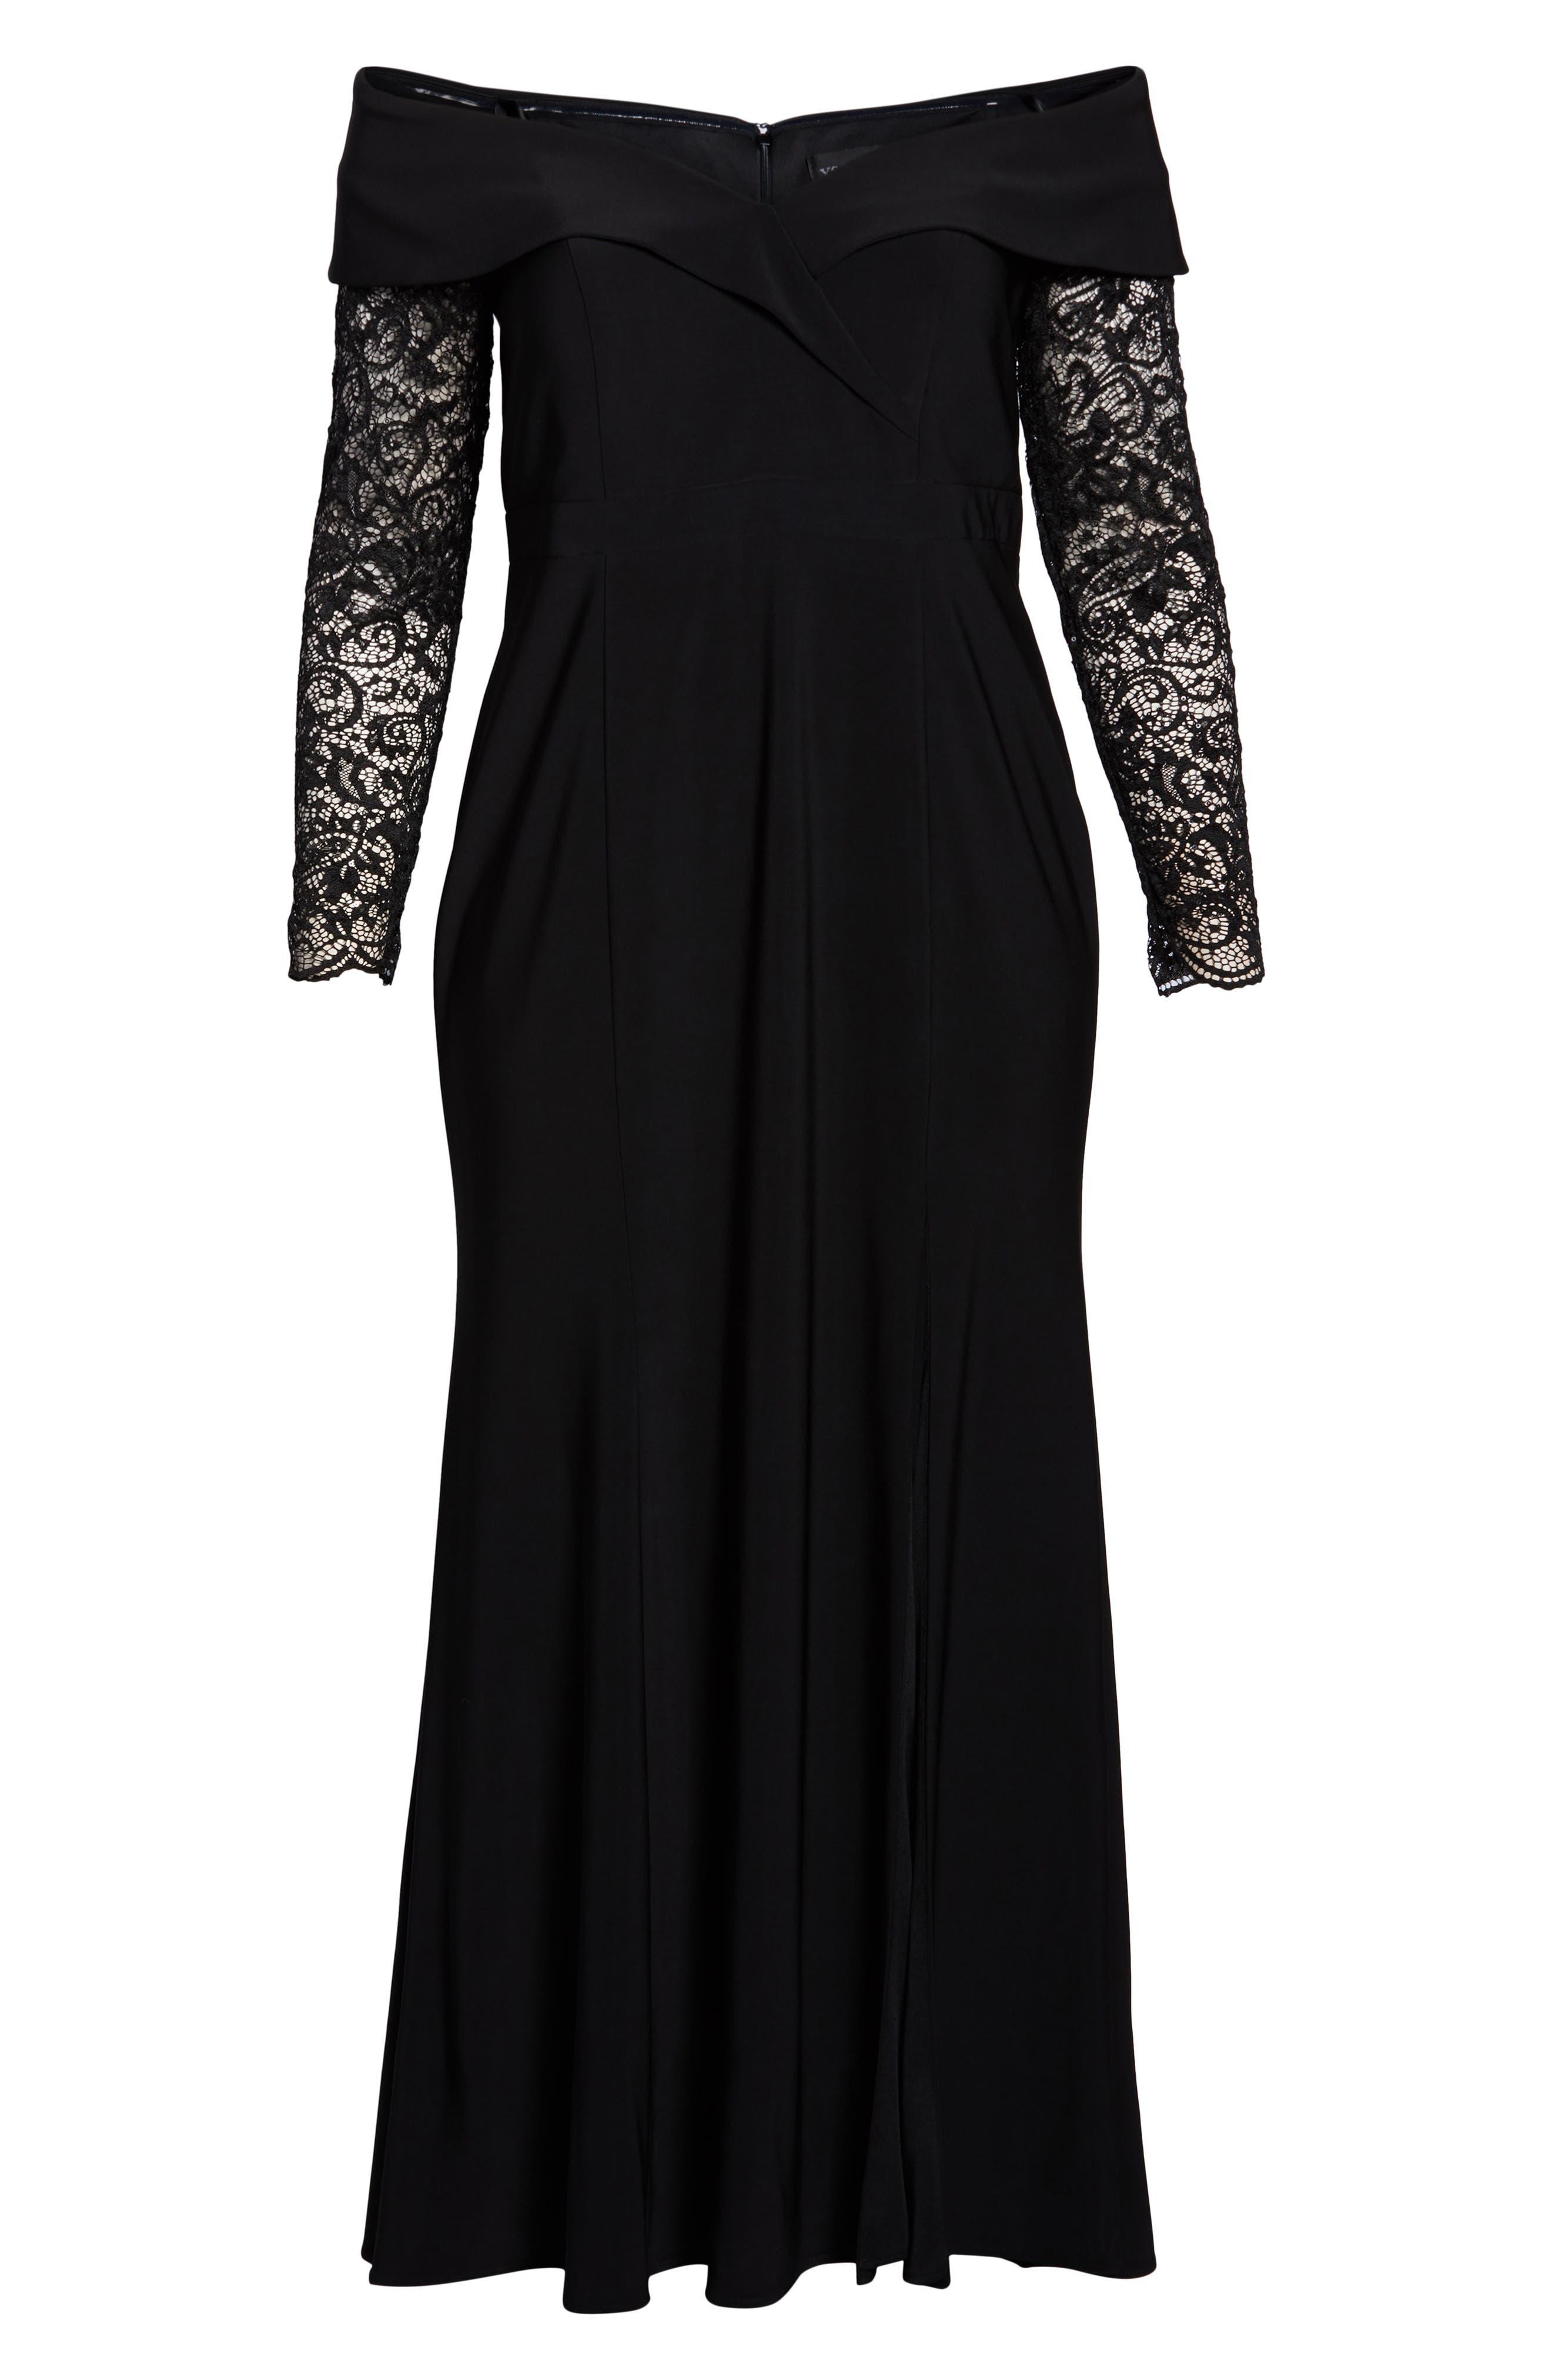 XSCAPE, Off the Shoulder Lace Sleeve Evening Gown, Alternate thumbnail 7, color, BLACK